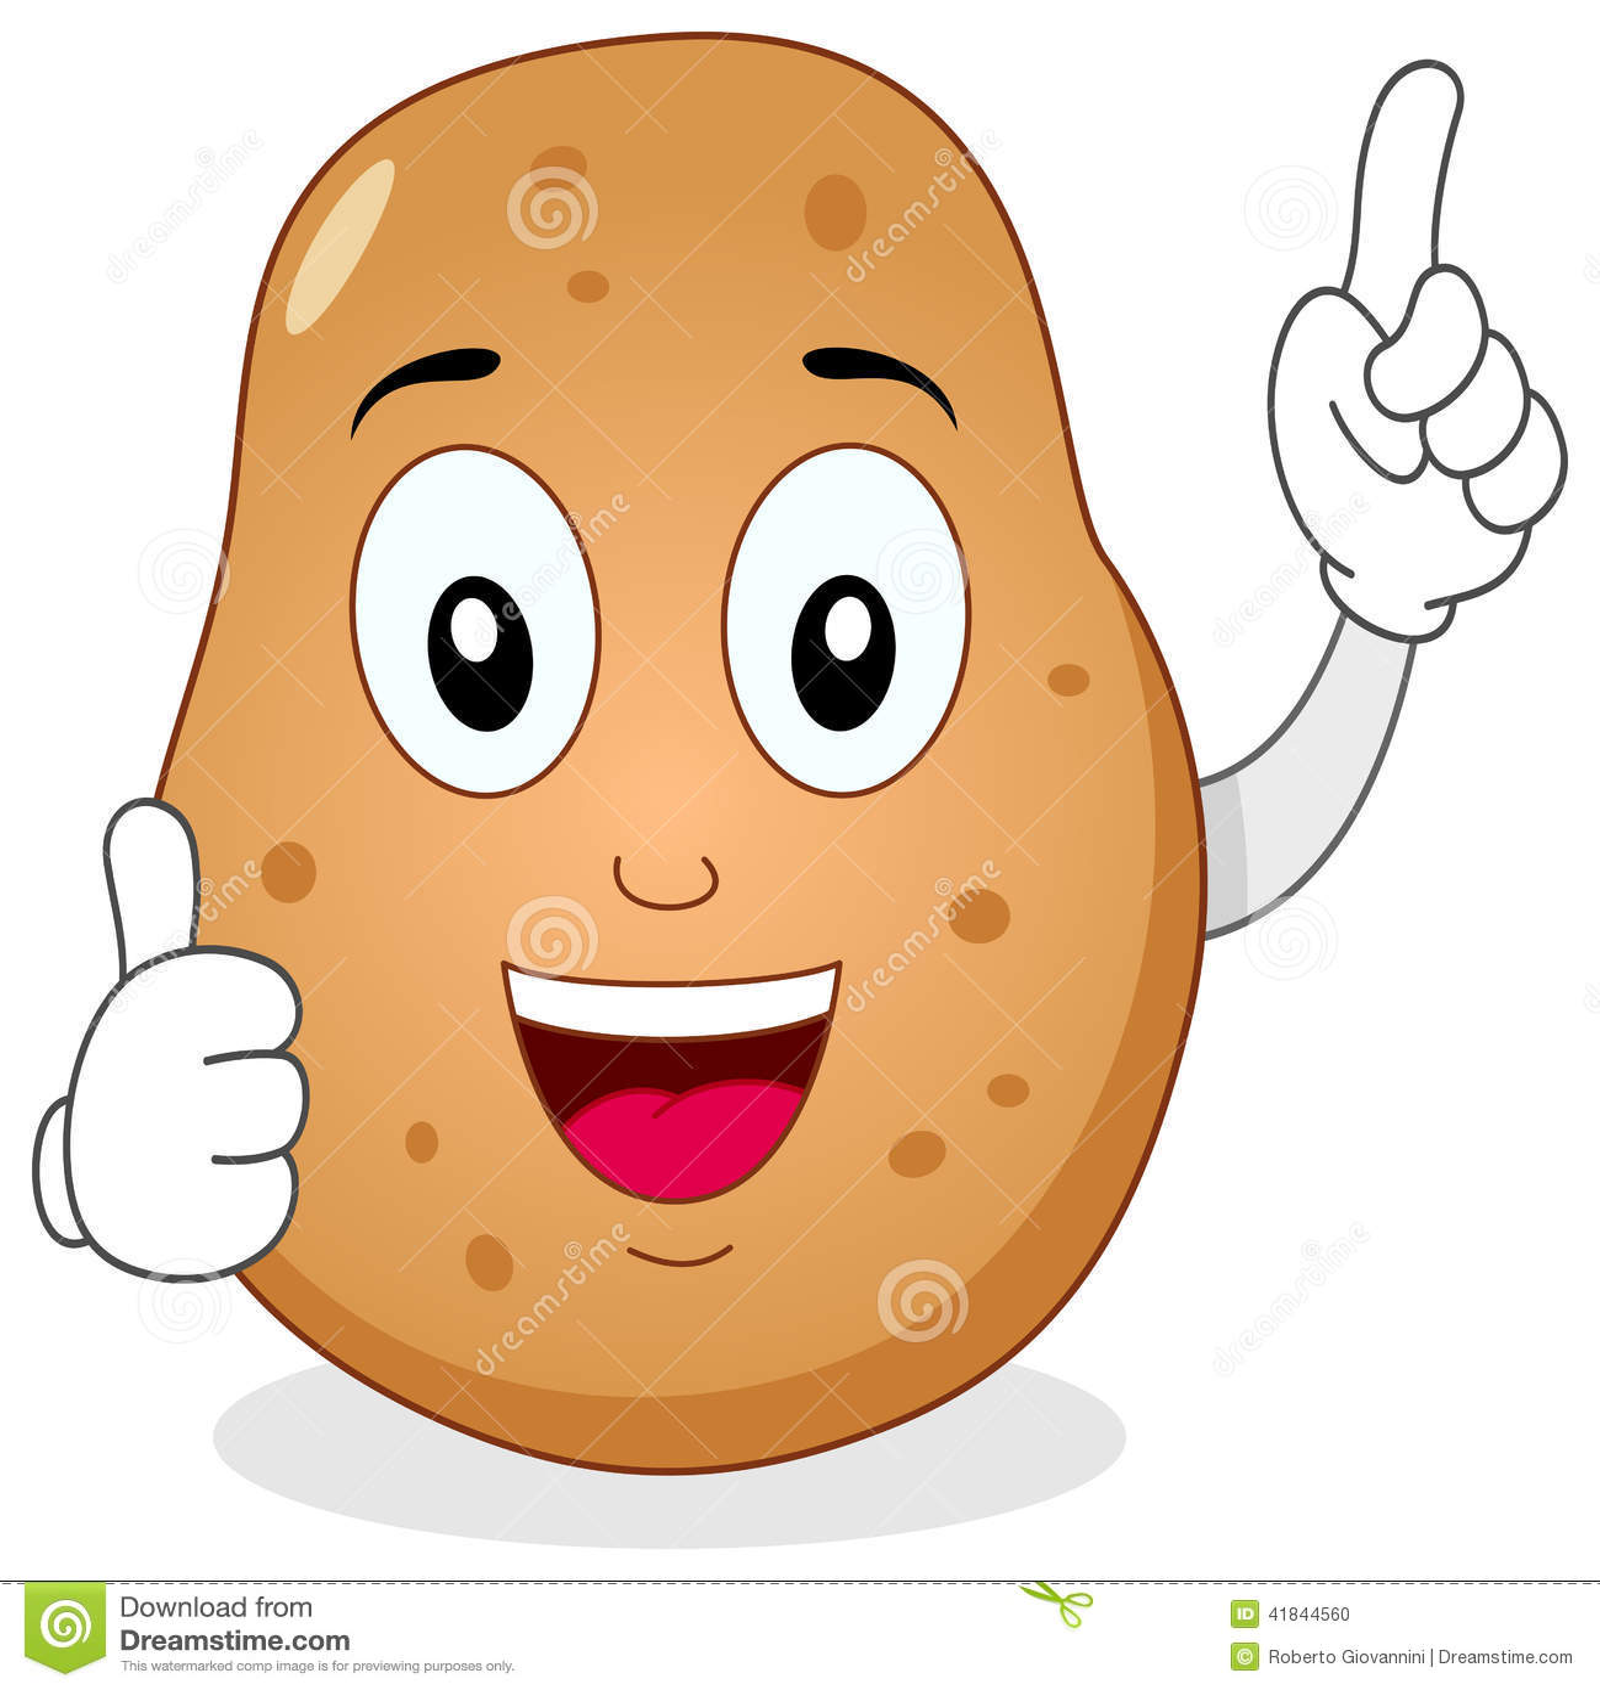 Cute Potato Character With Thumbs Up Stock Vector - Image ...  Cute Potato Cha...